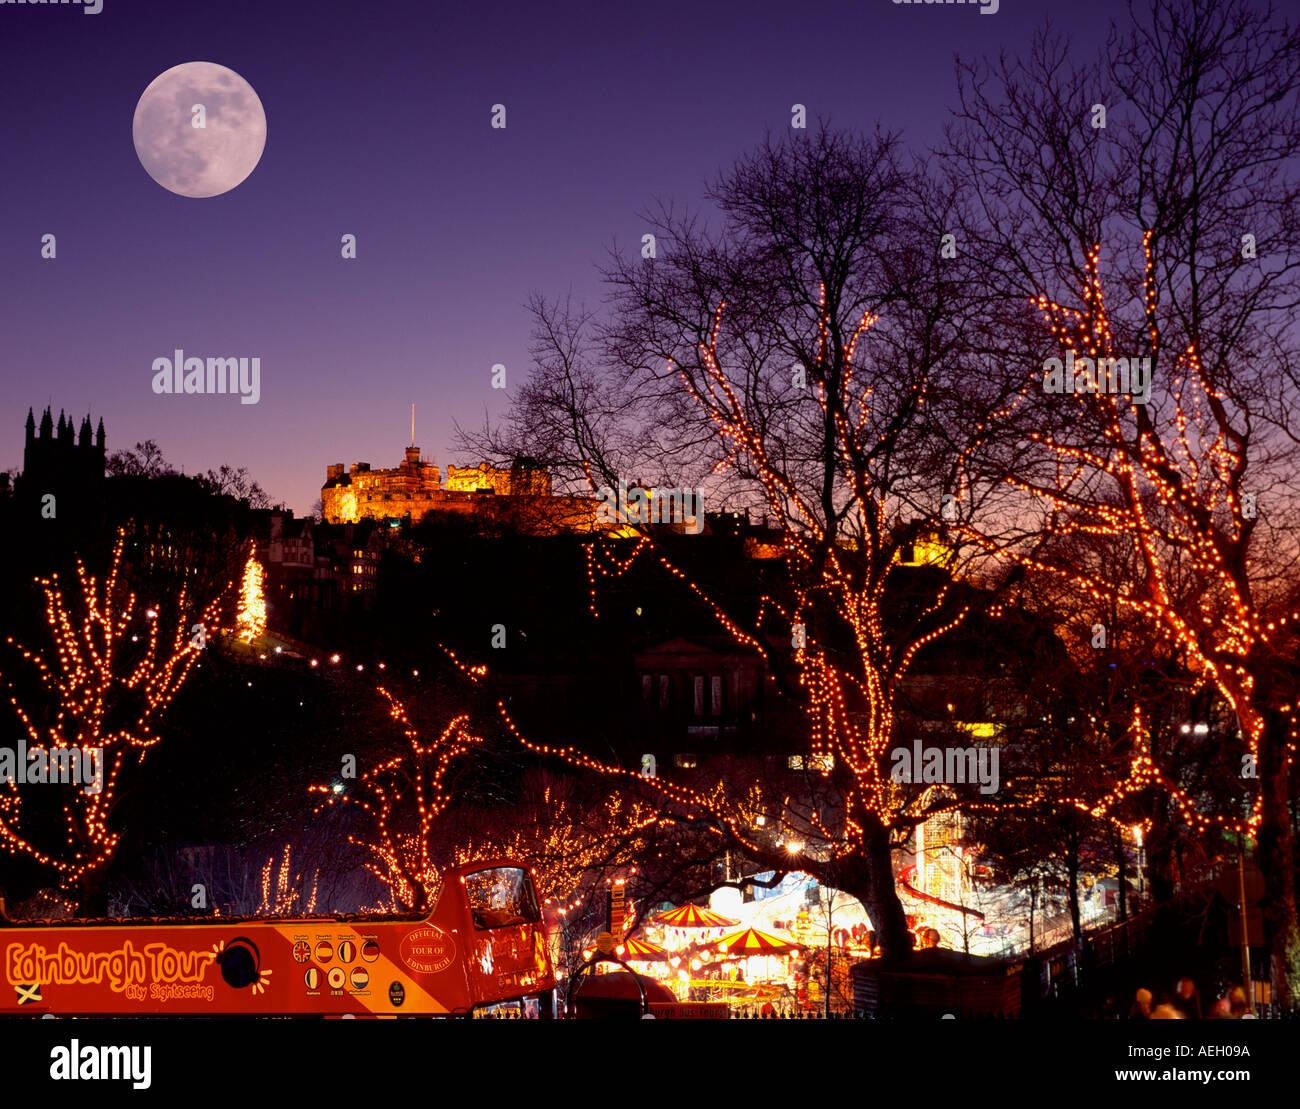 Light Shop In Edinburgh: UK Scotland City Of Edinburgh Christmas Lights At Princes